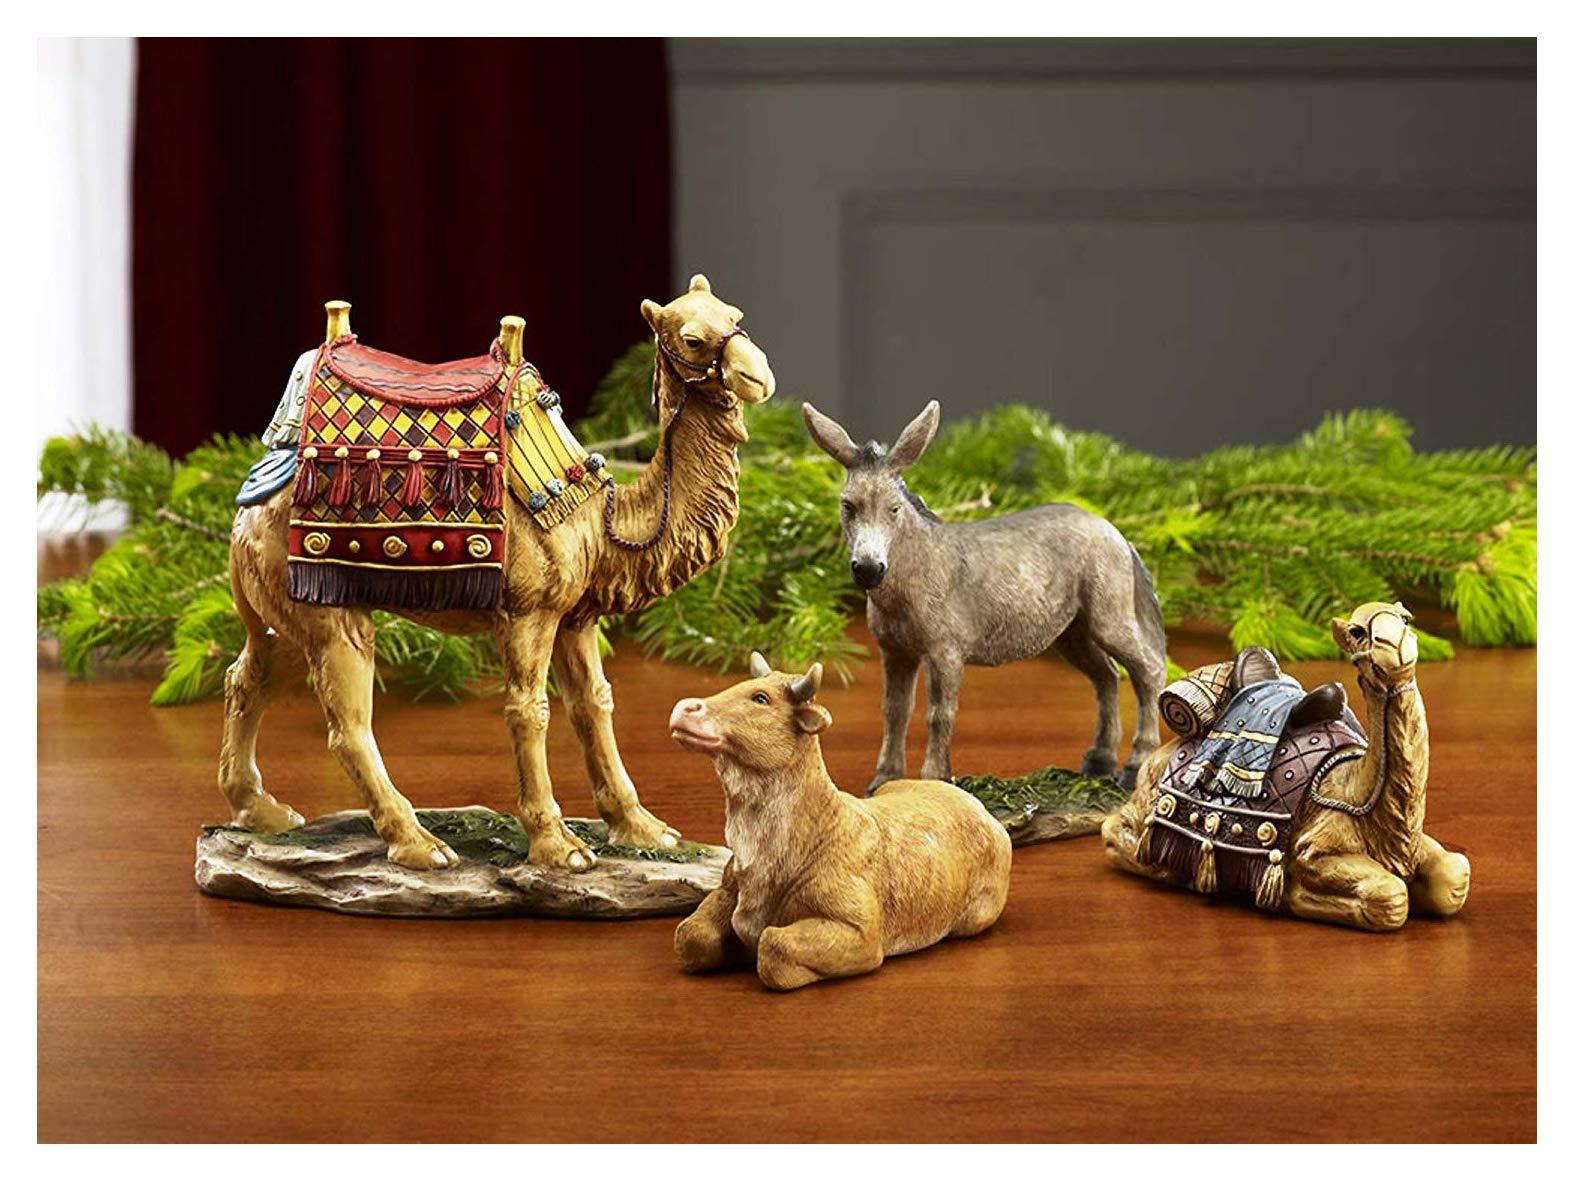 Set of 4 Christmas Nativity Animals Set - 14 inch Scale